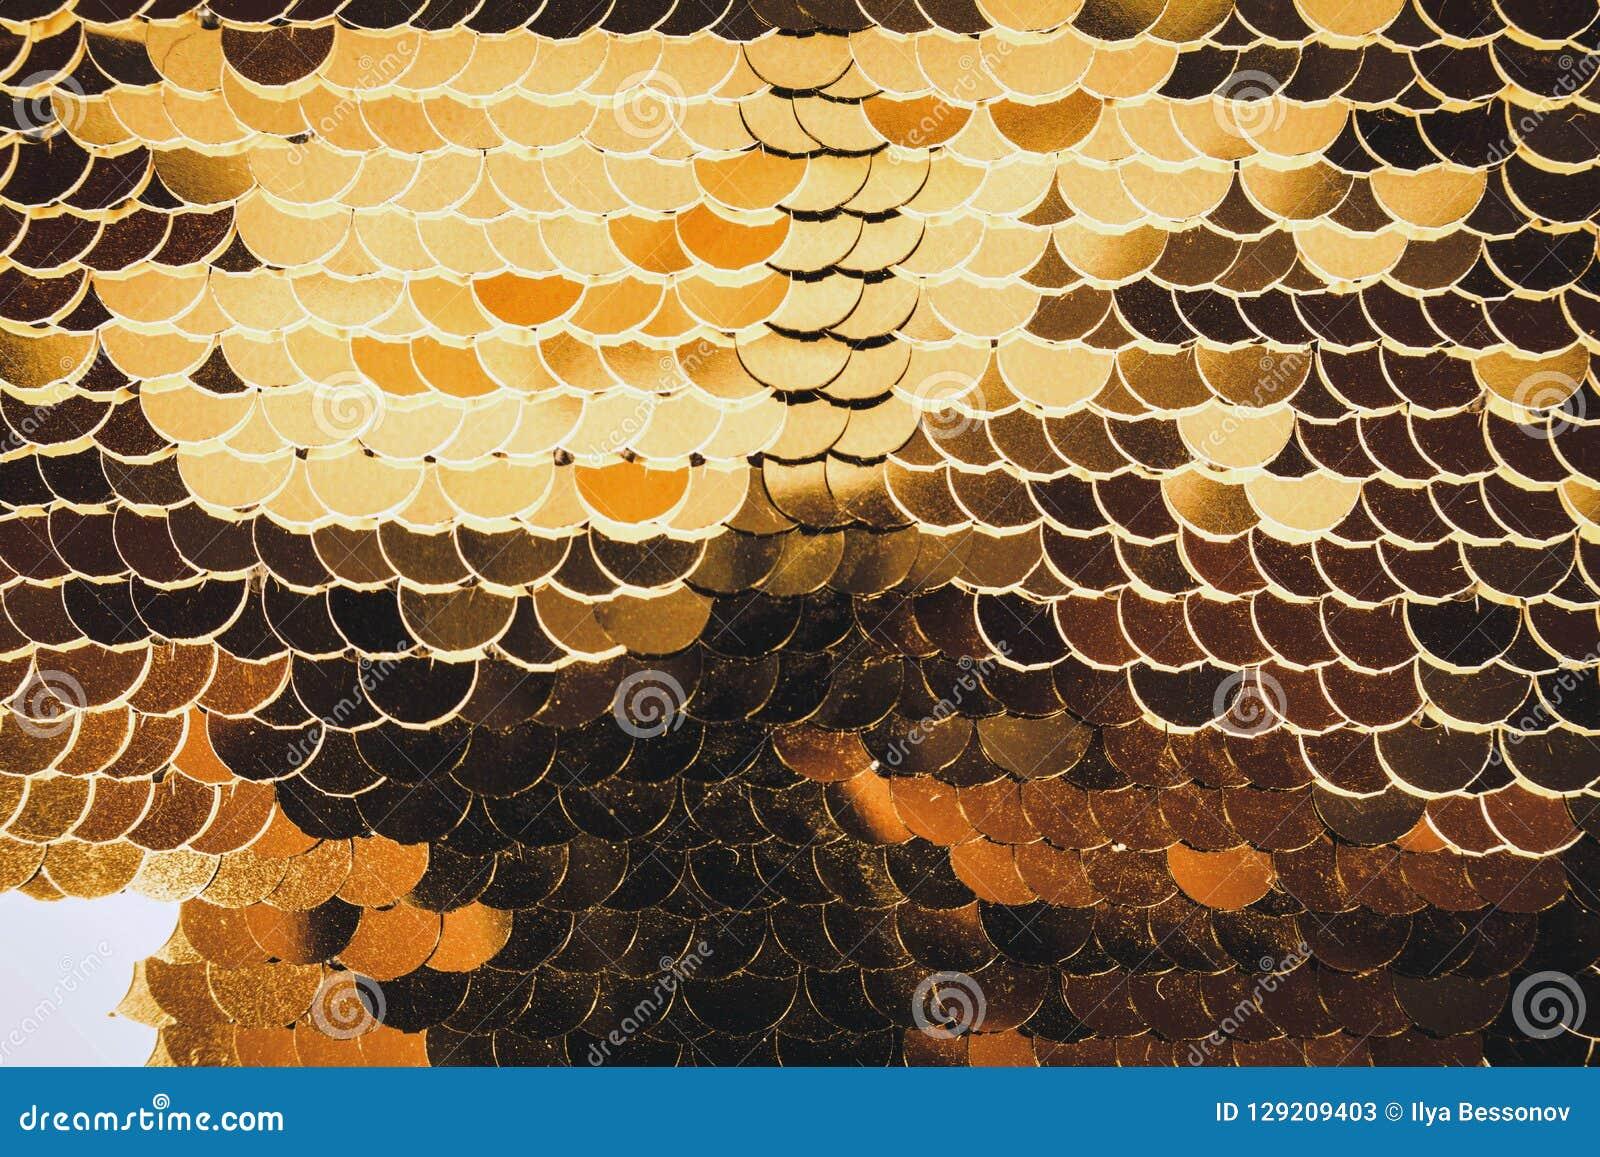 O peixe escala brilhante dourado vislumbra em cores diferentes glamorous